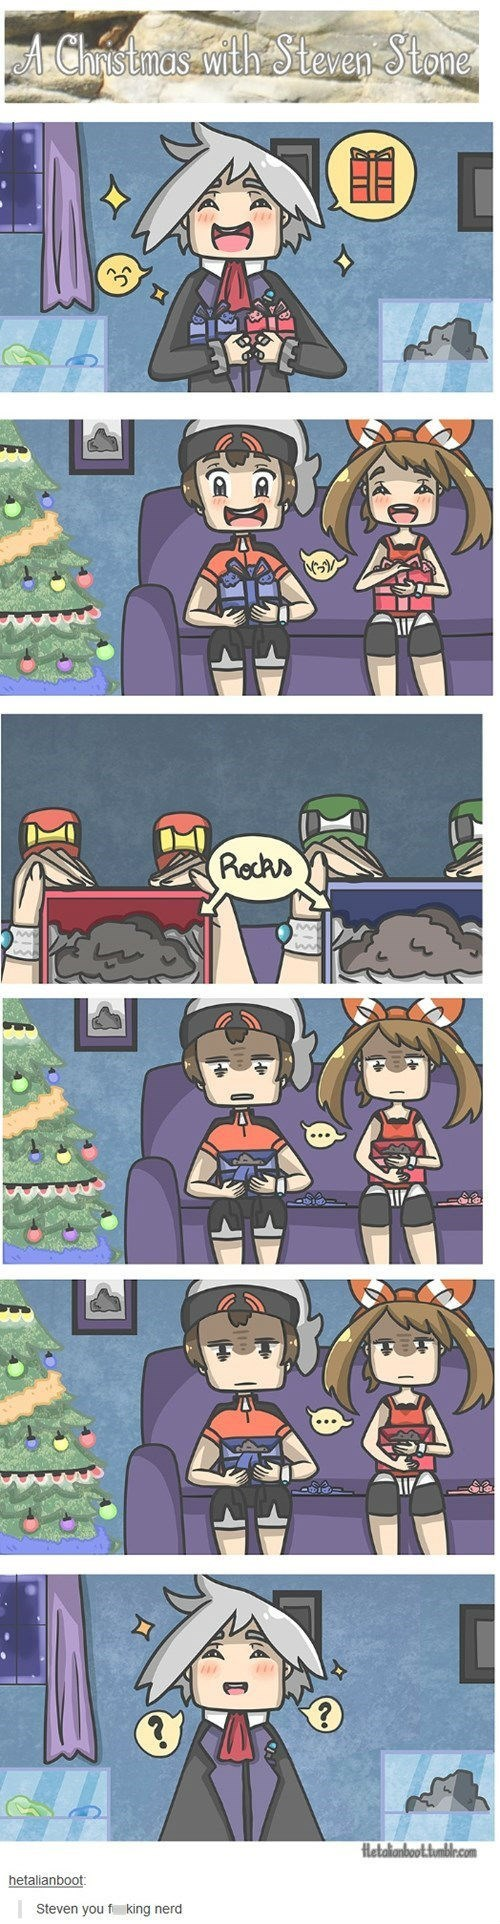 steven stone web comics christmas - 8405791488